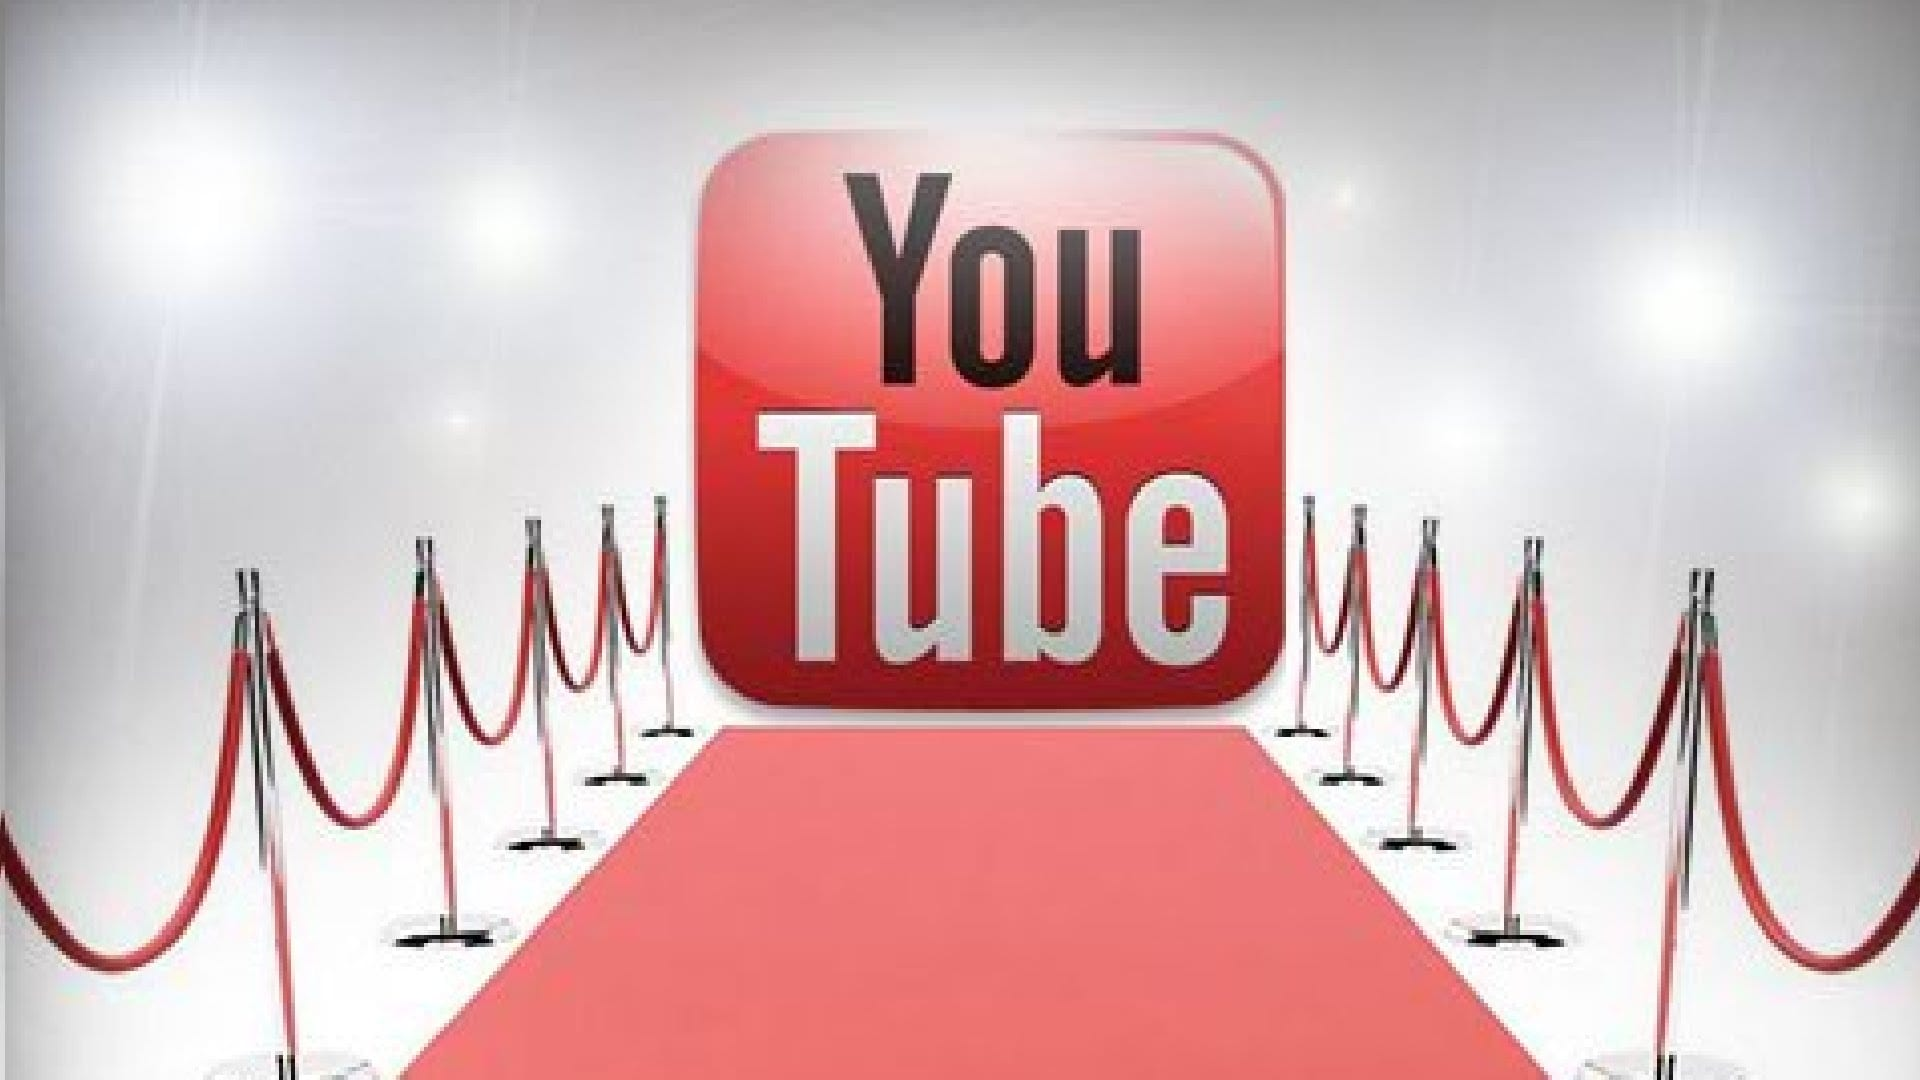 Karnevalslieder - YouTube